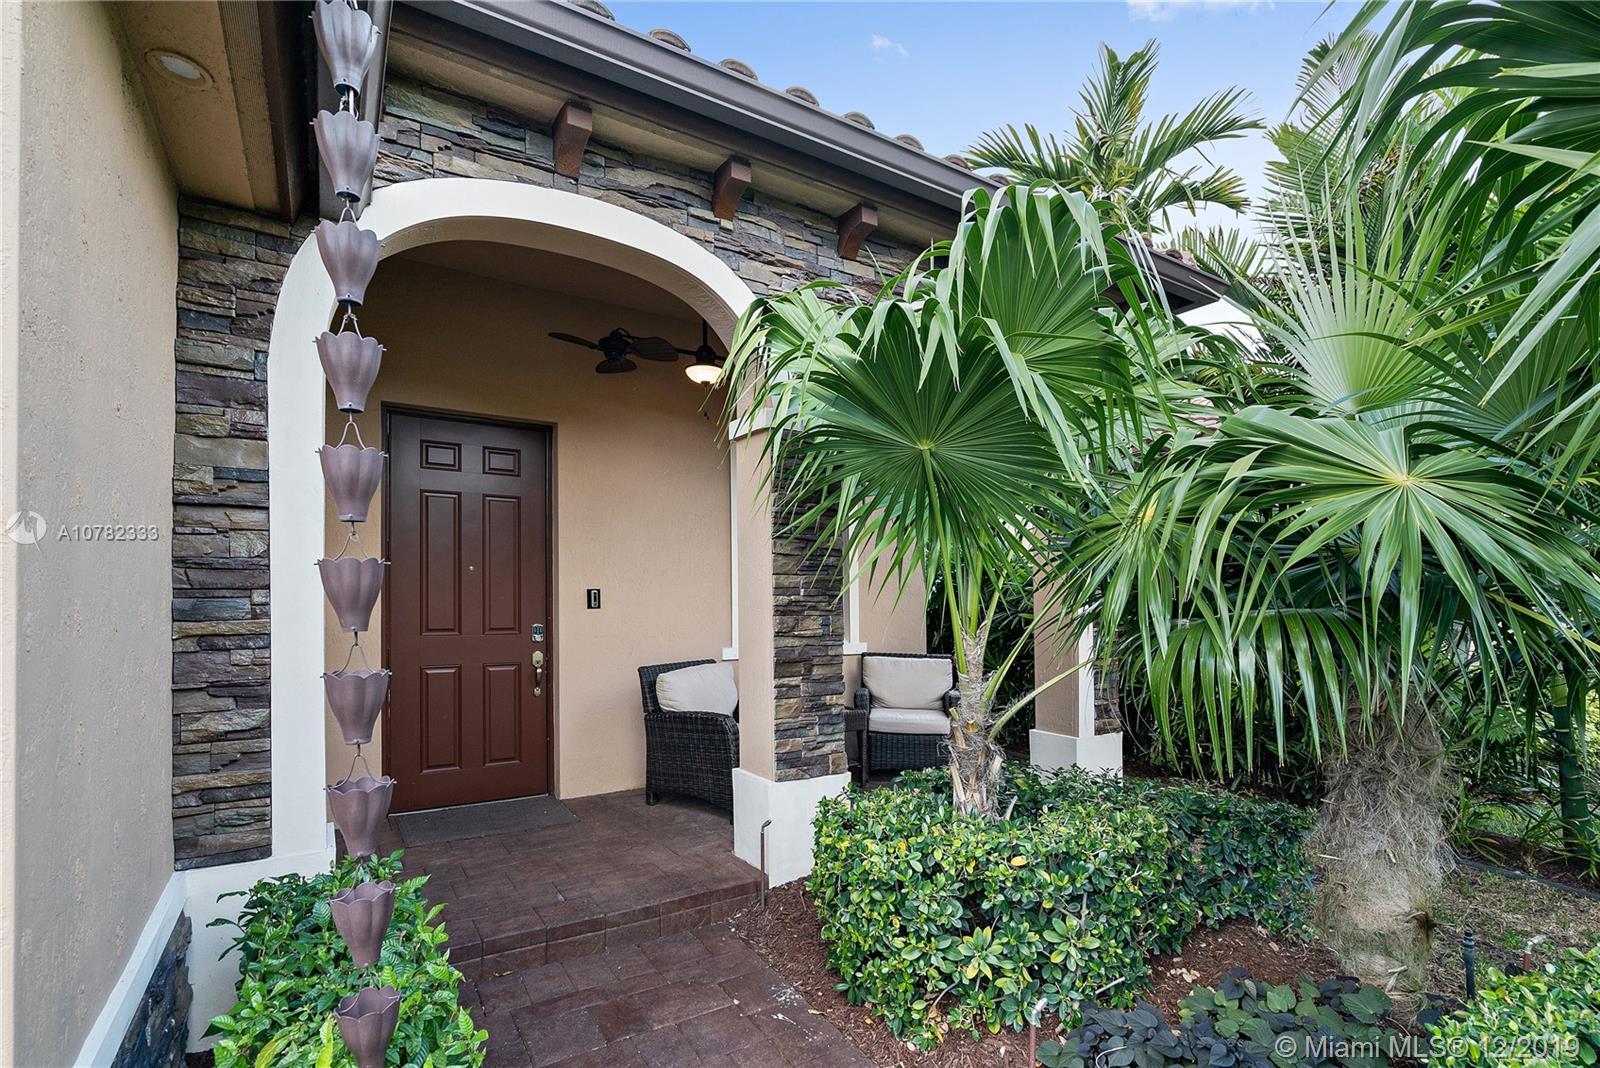 564 SE 35 Terrace, Homestead FL 33033